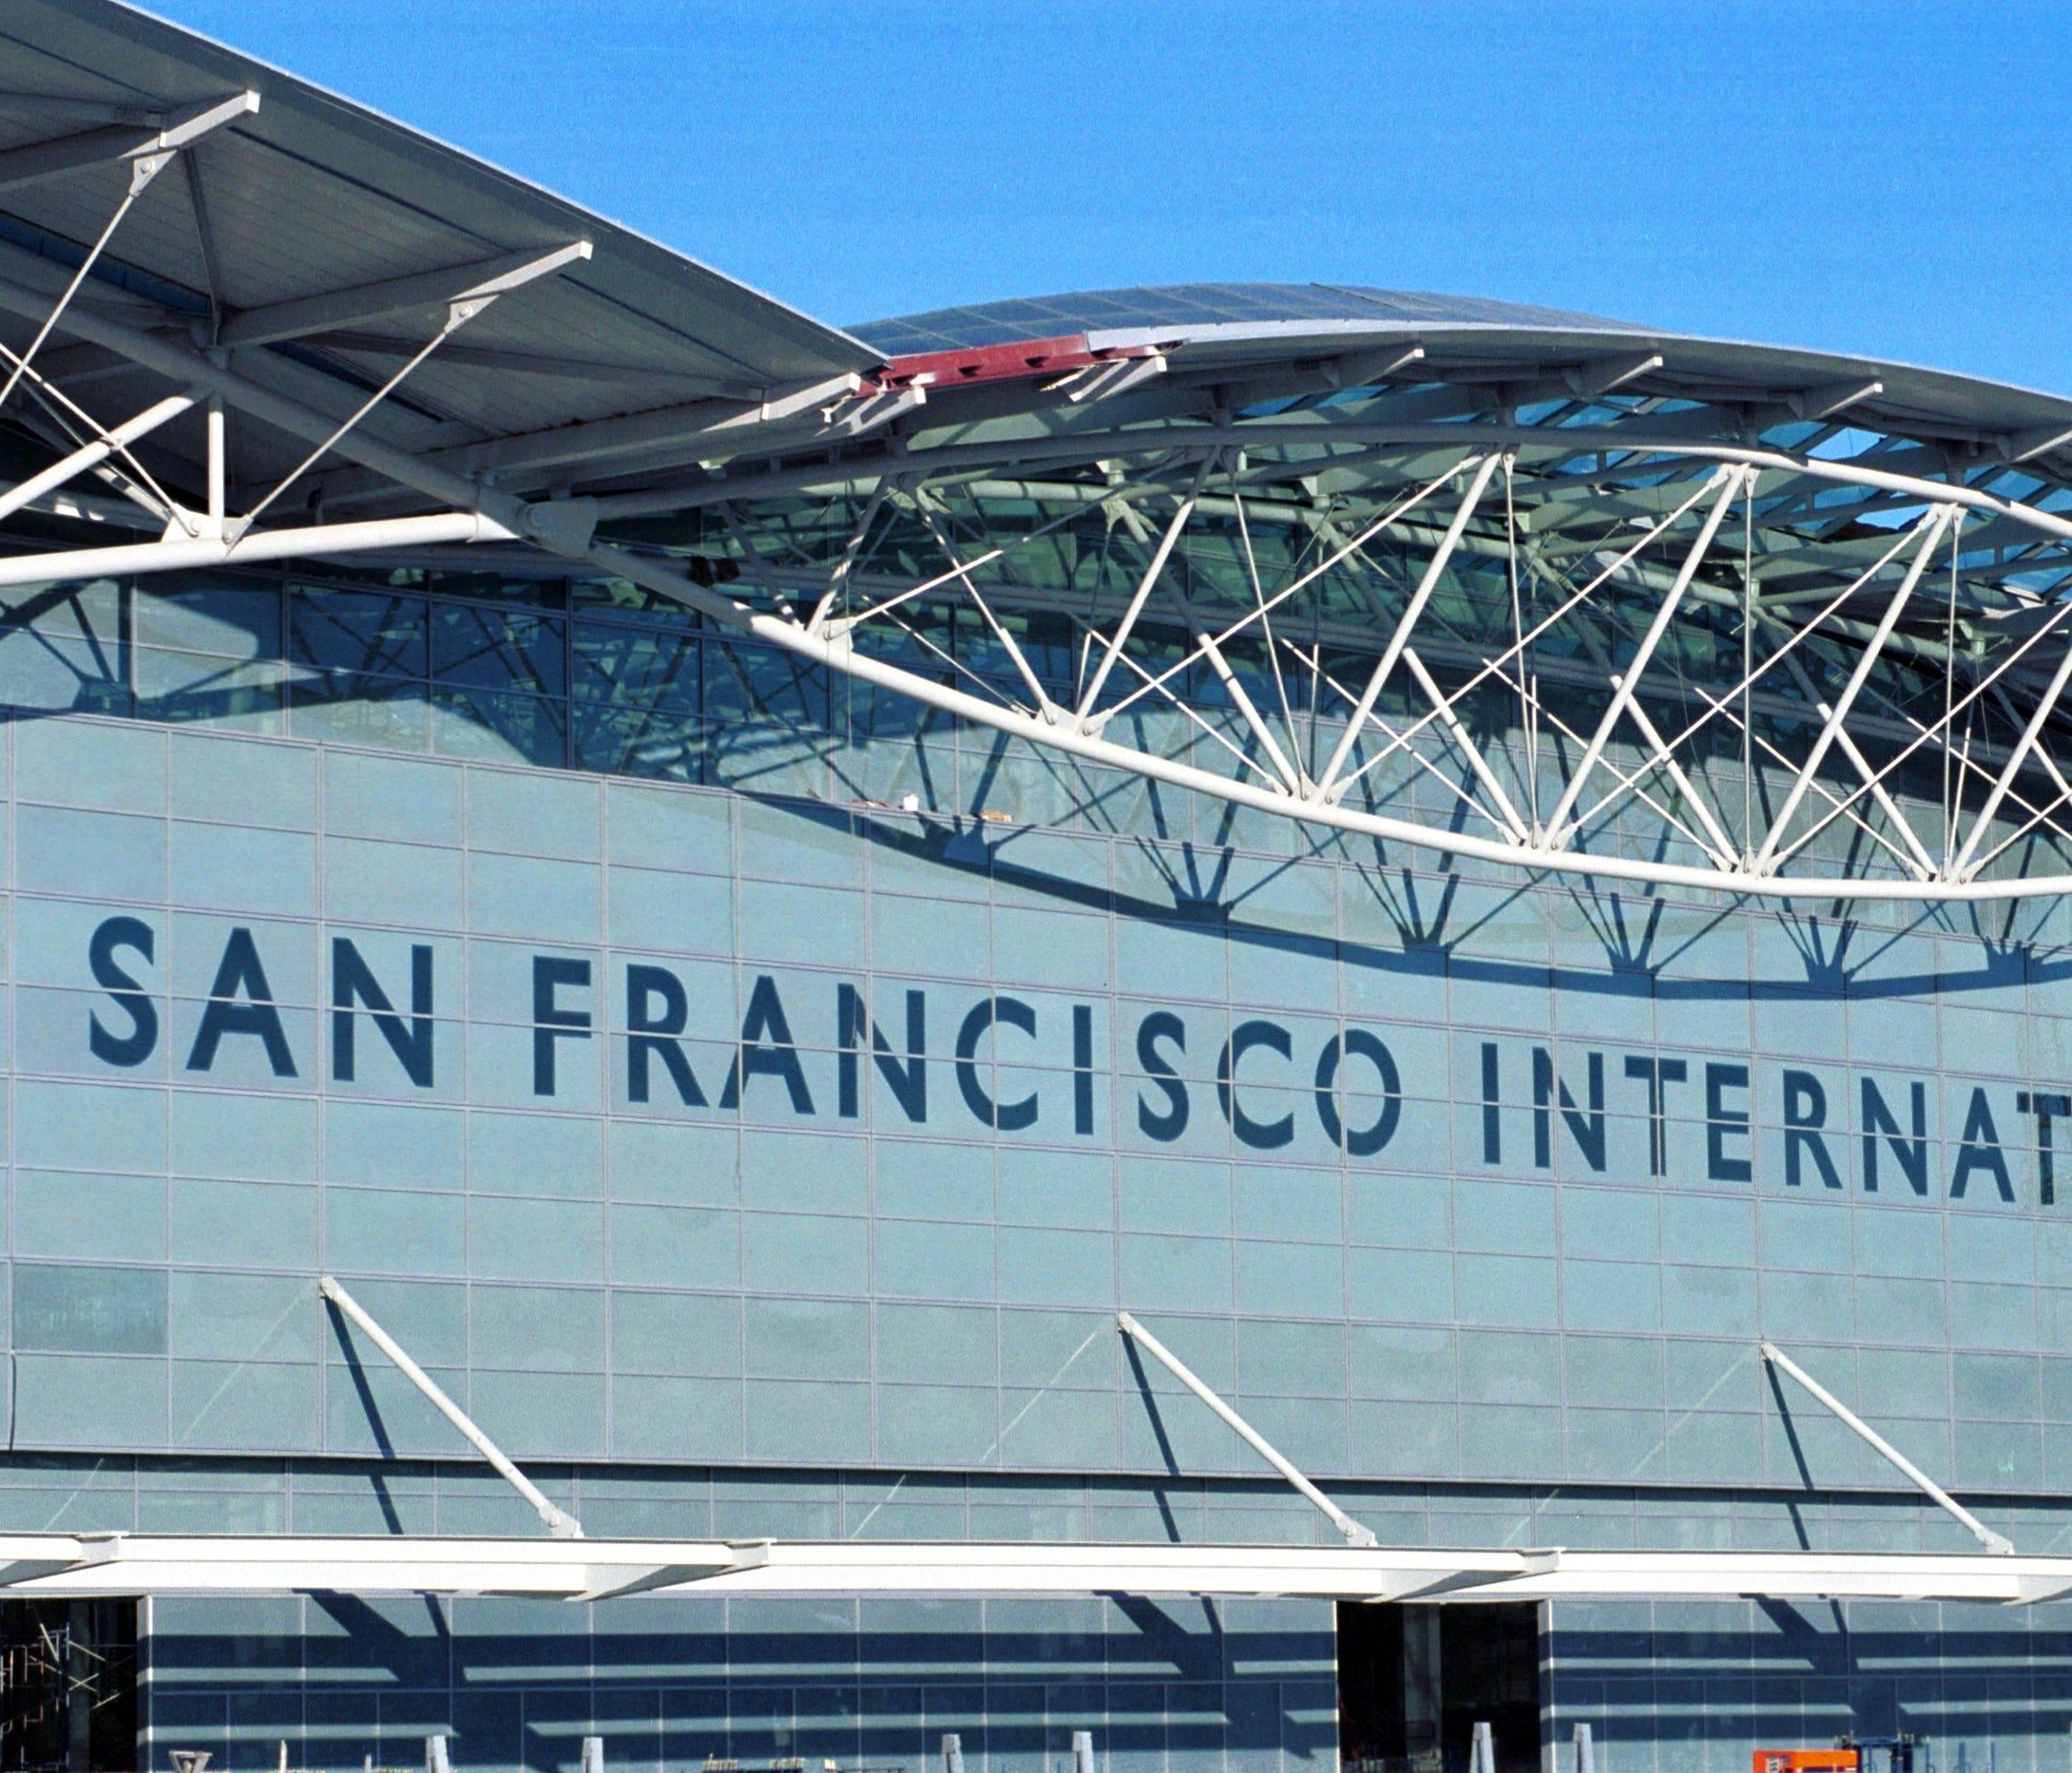 The International Terminal at San Francisco International Airport.